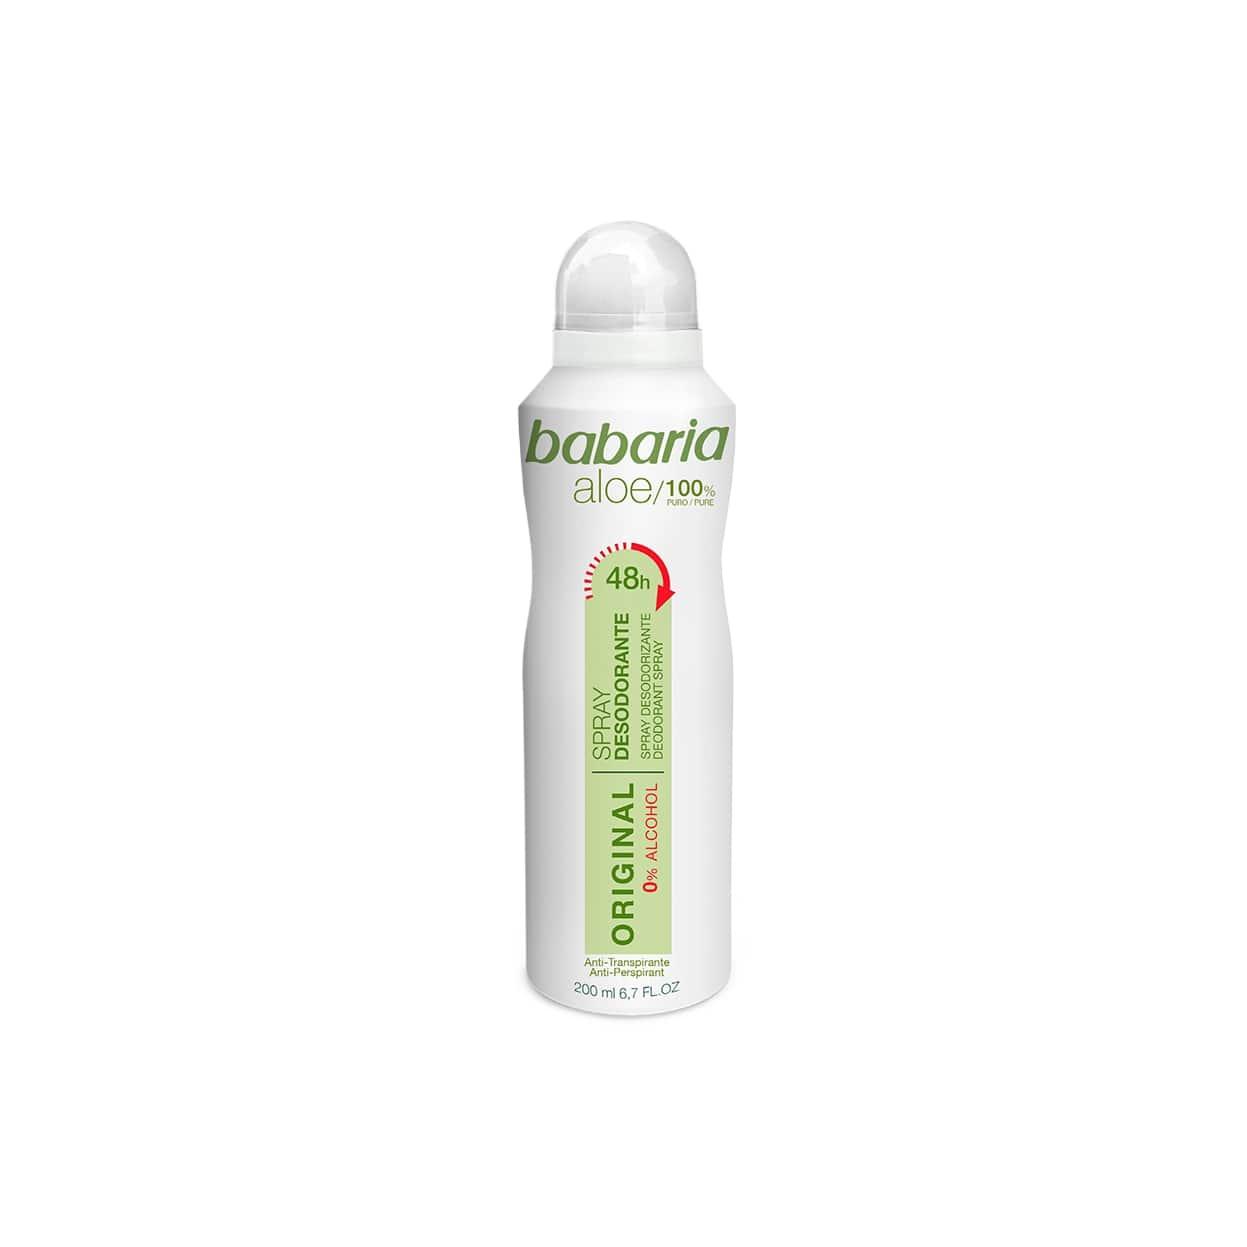 babaria deodorante spray original (200 ml)